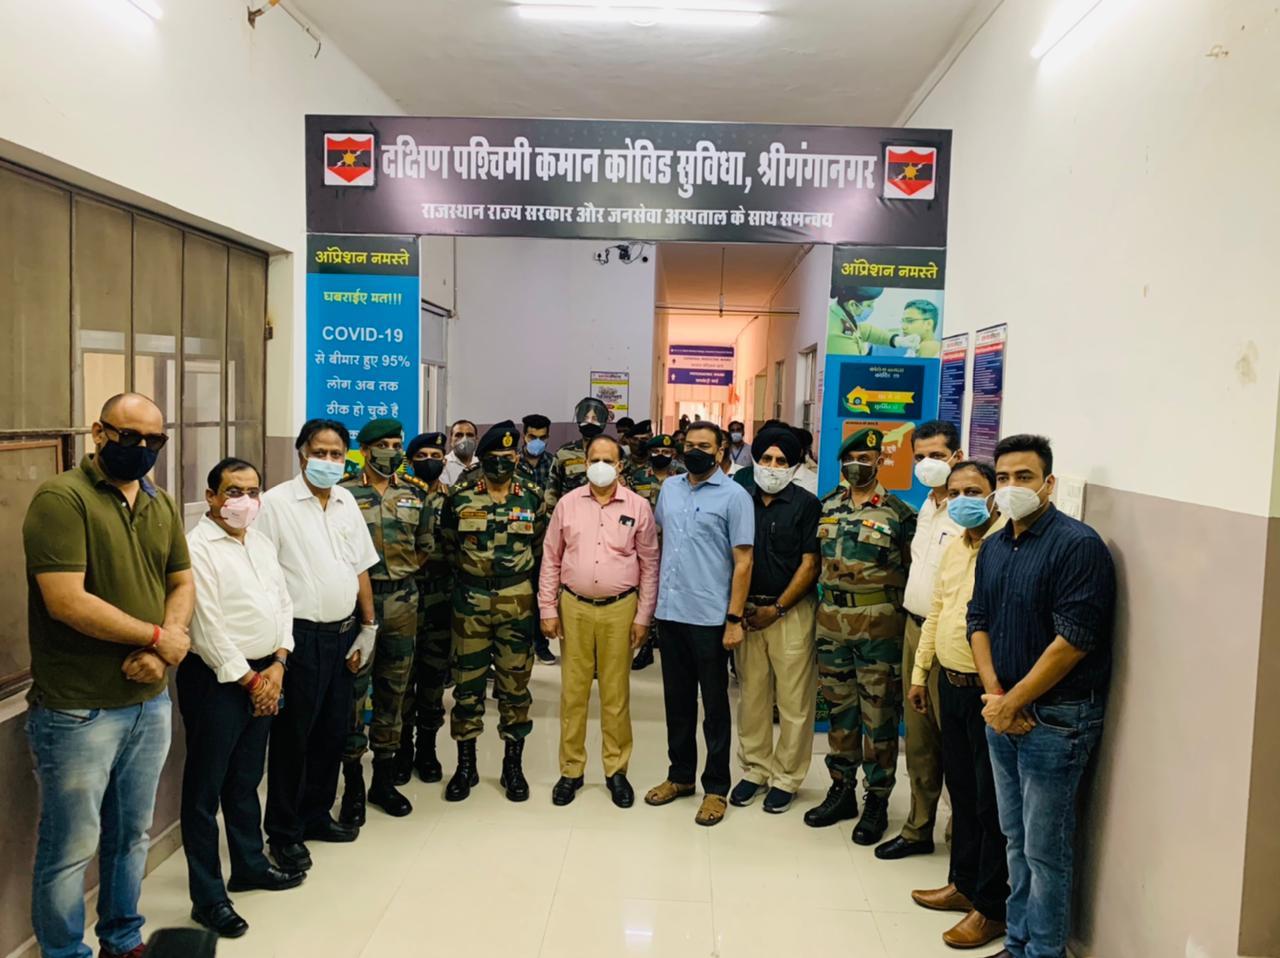 Indian Army dedicates 50 bed covid facility in Sriganganagar